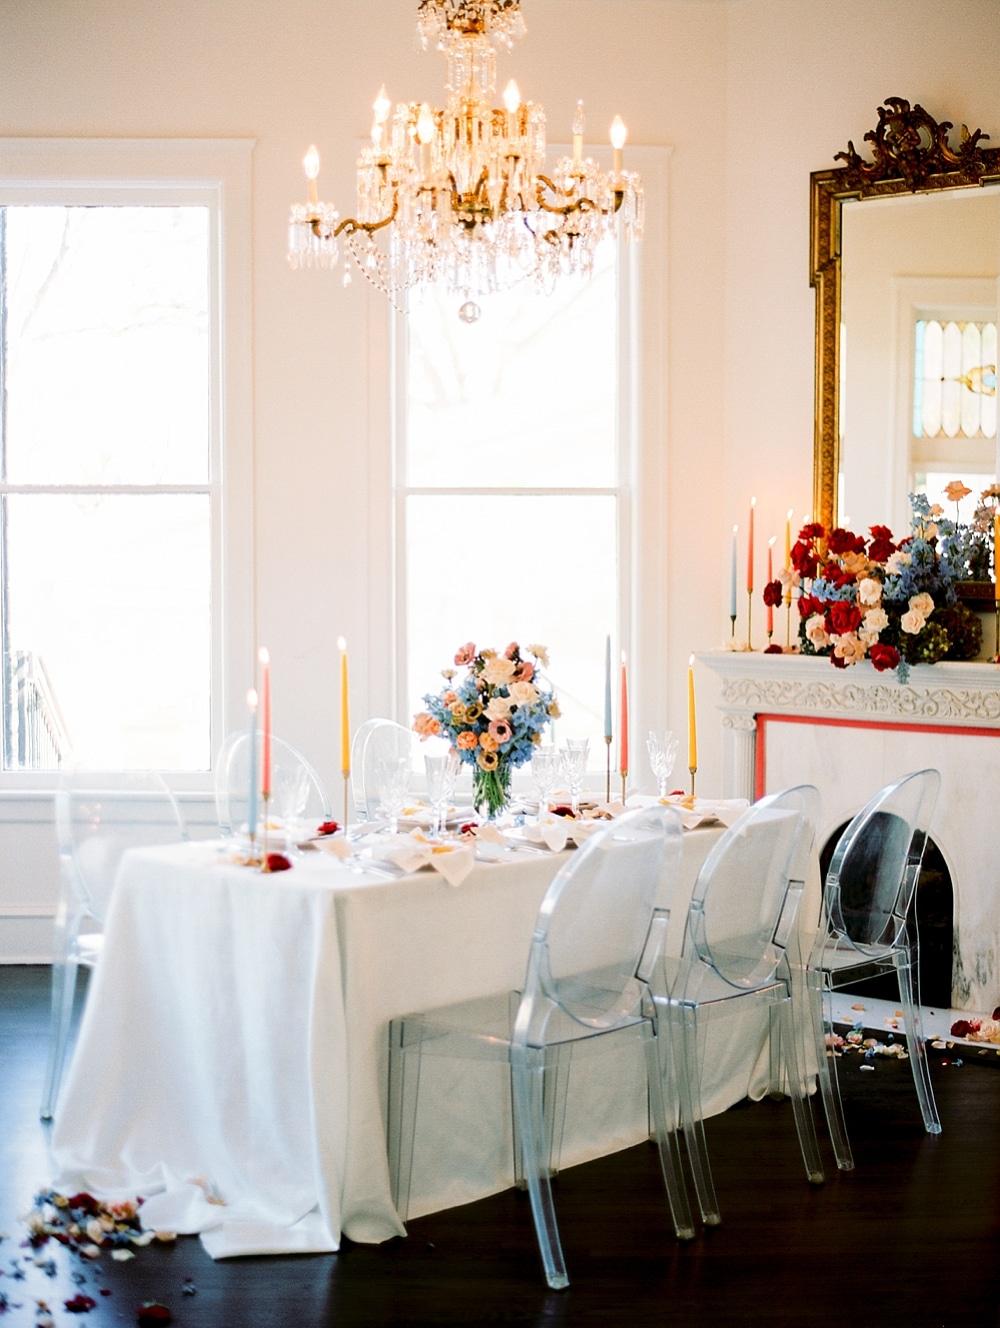 kristin-la-voie-photography-austin-wedding-photographer-woodbine-mansion-208